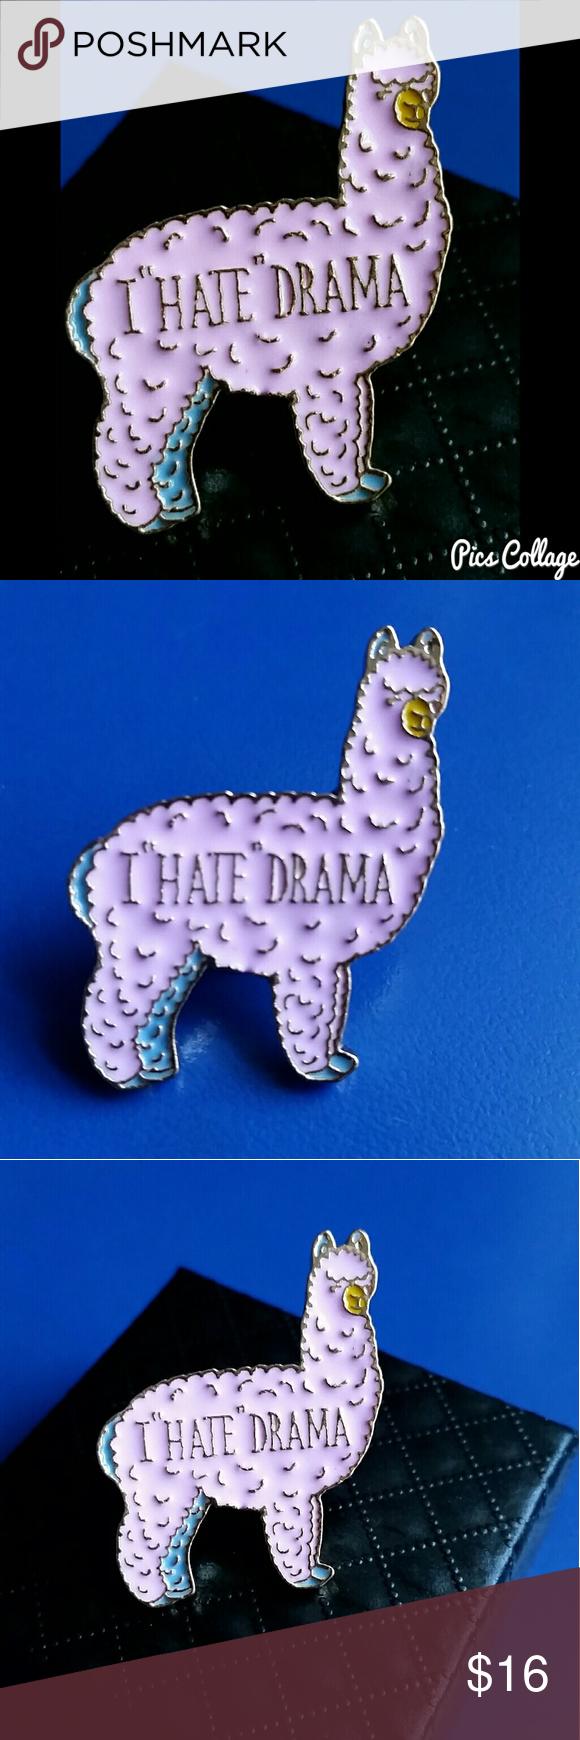 Good Llama Hates Drama Enamel Pin Super Cute Pink Llama Pin That Says